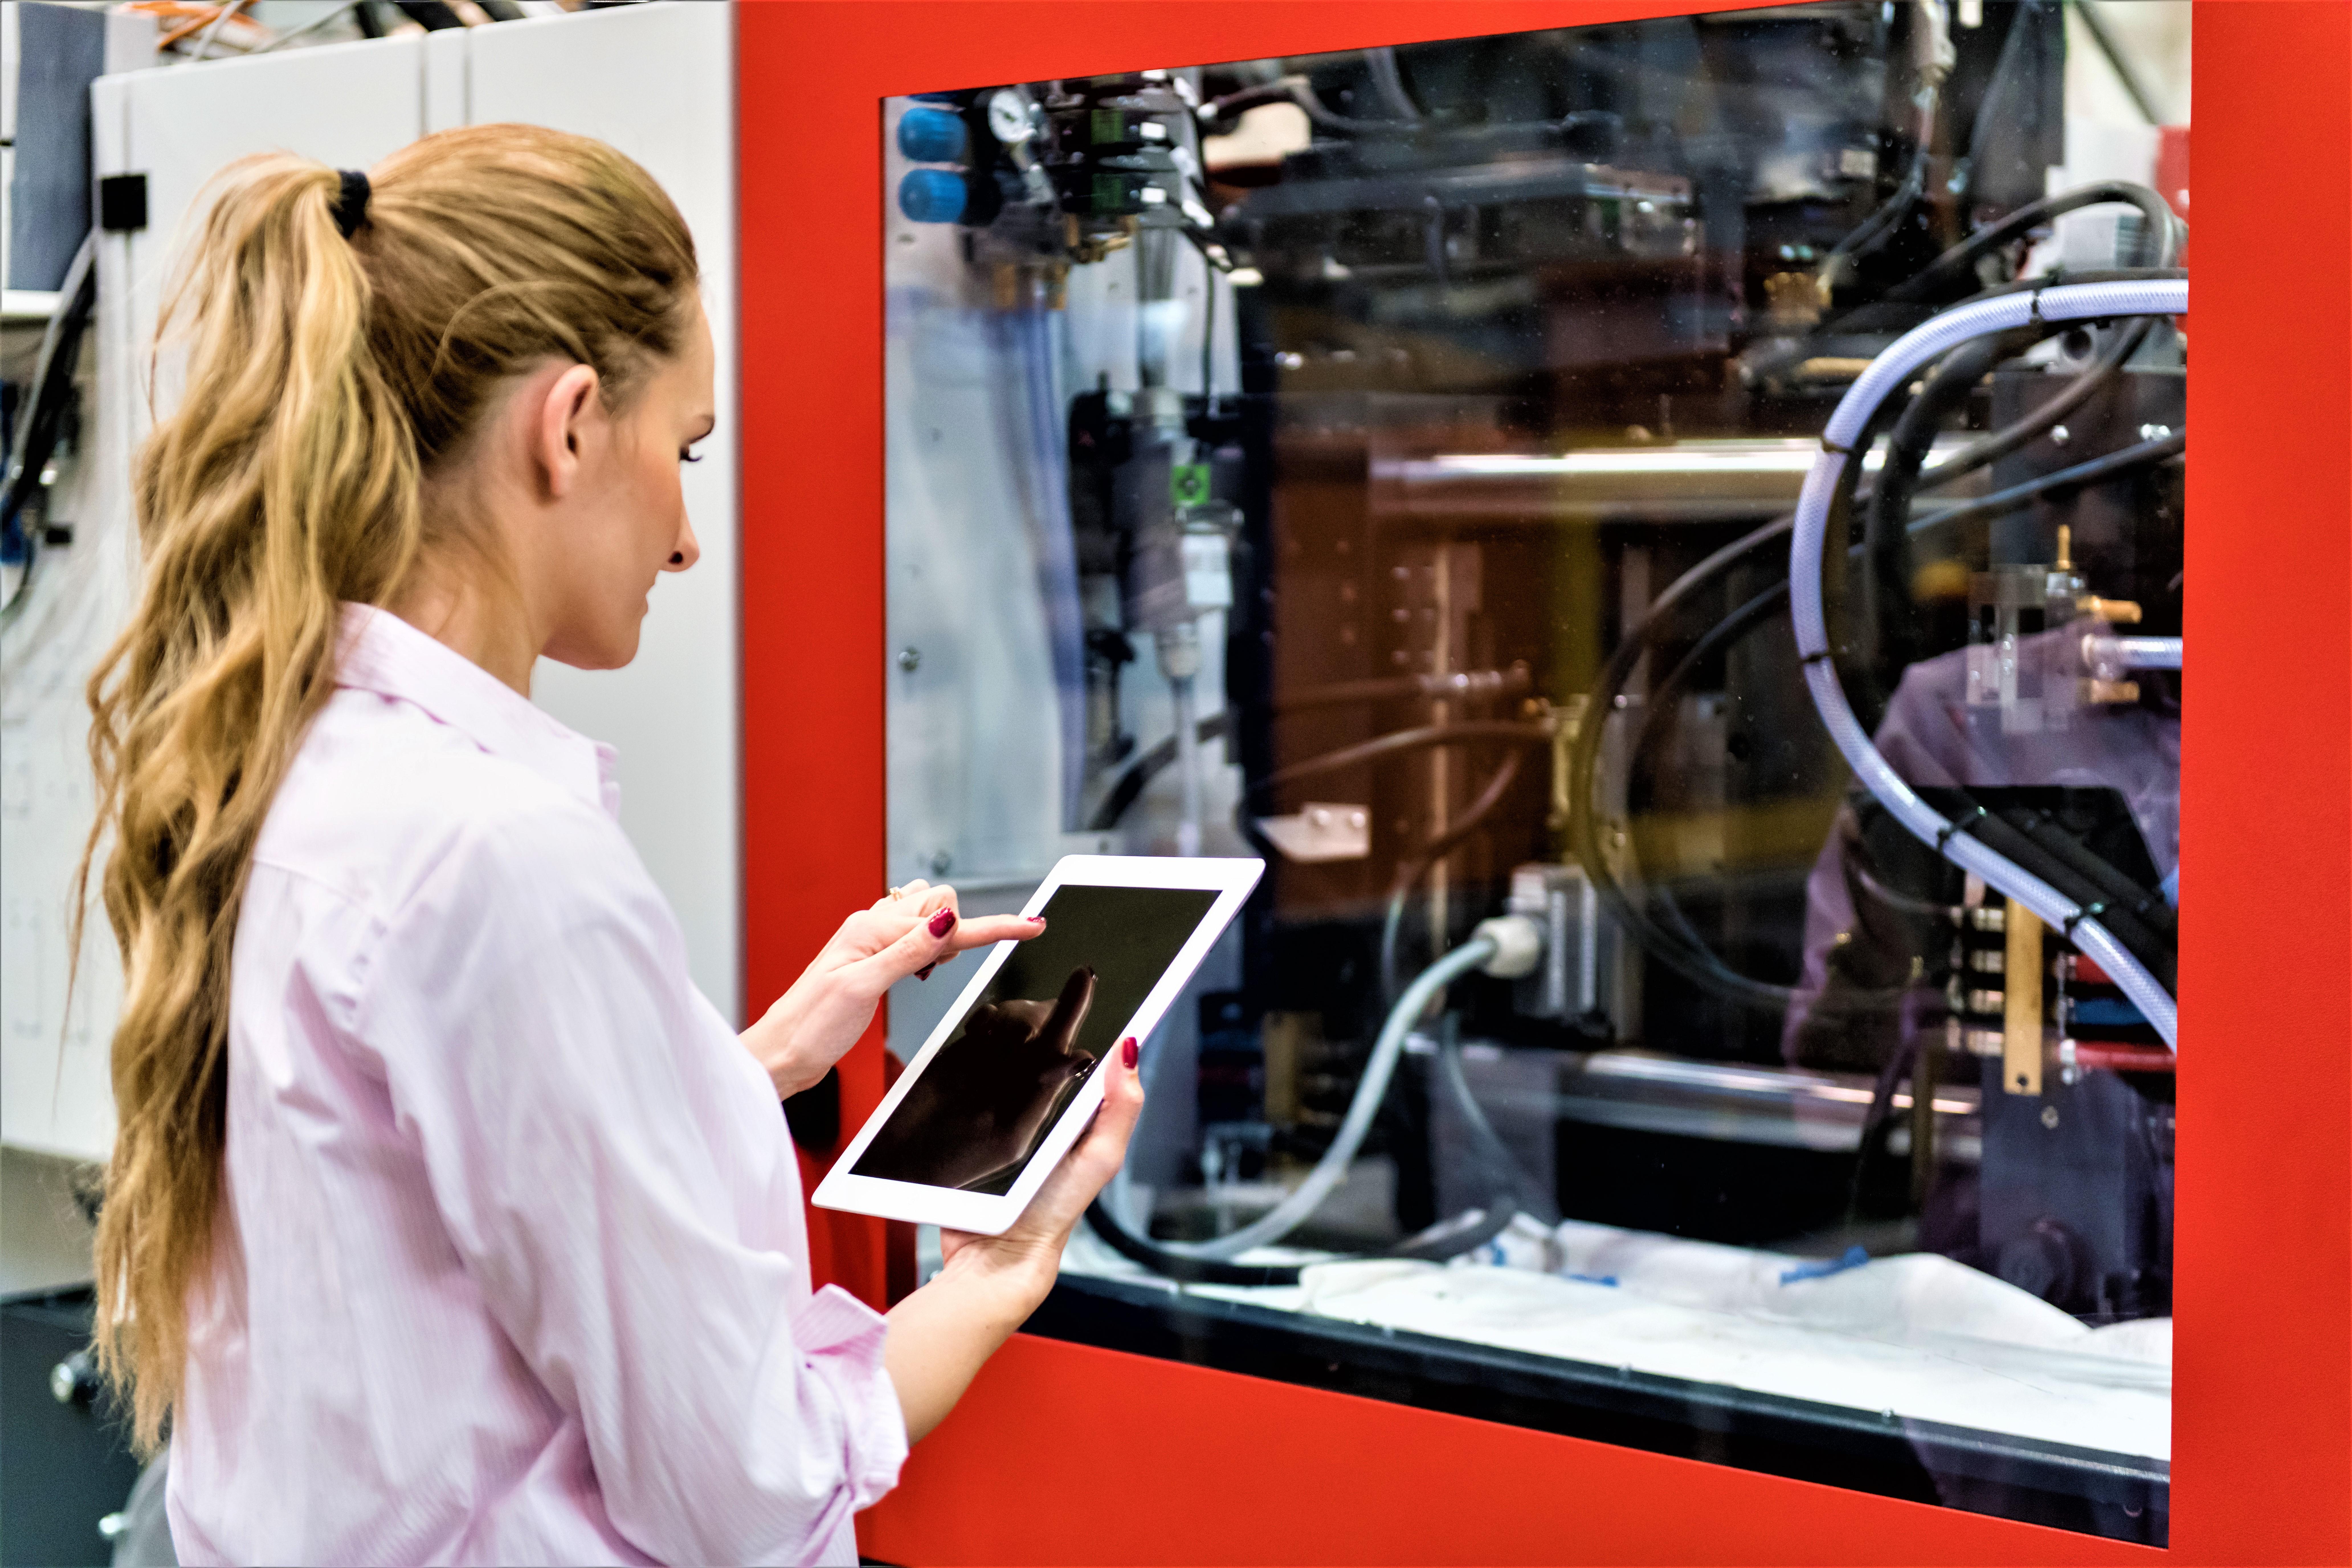 Smart Machines Are The Future Of Manufacturing - Enterprise Irregulars